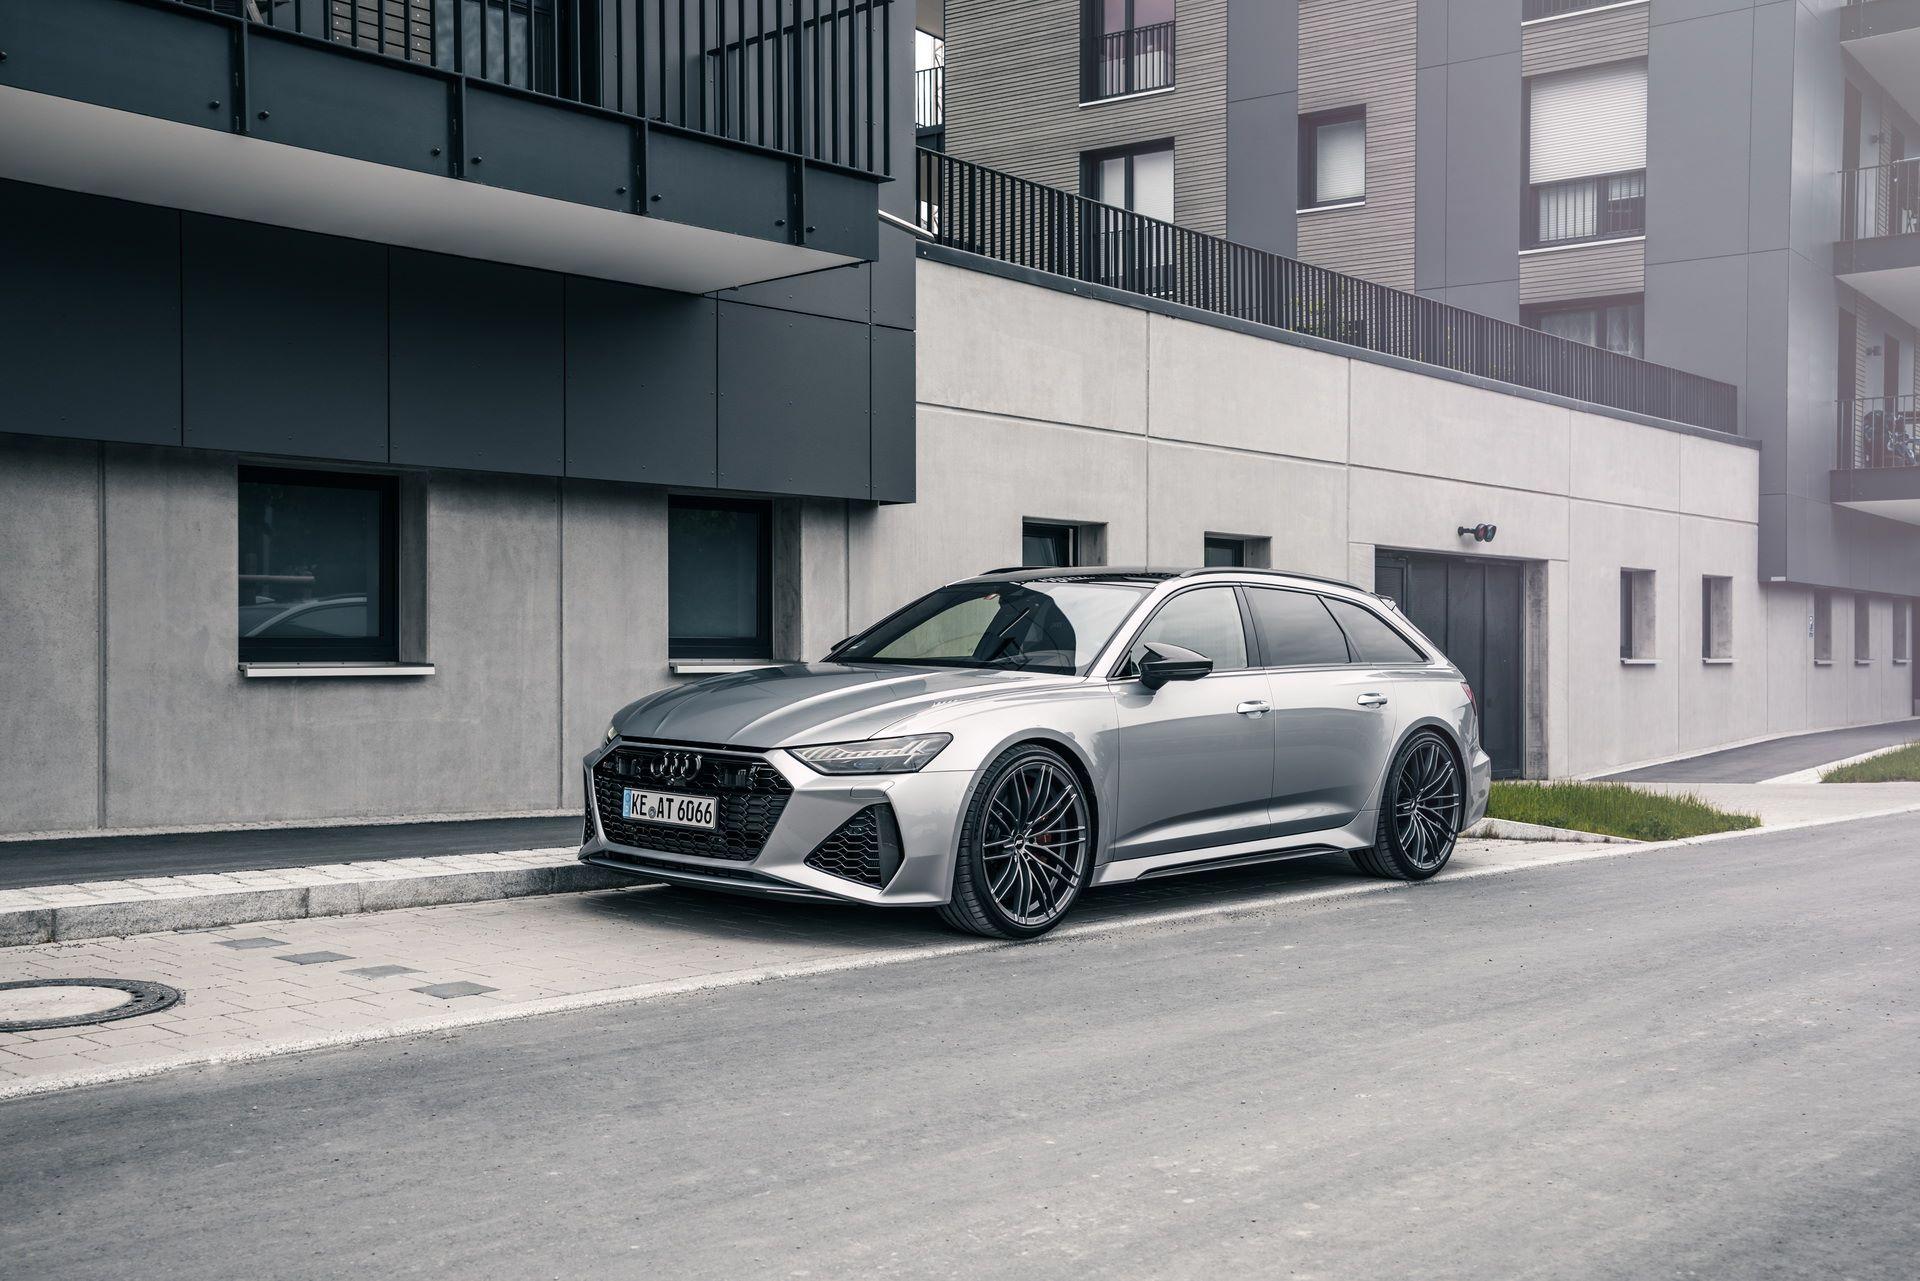 Audi RS6 Avant 2020 ABT Sportsline